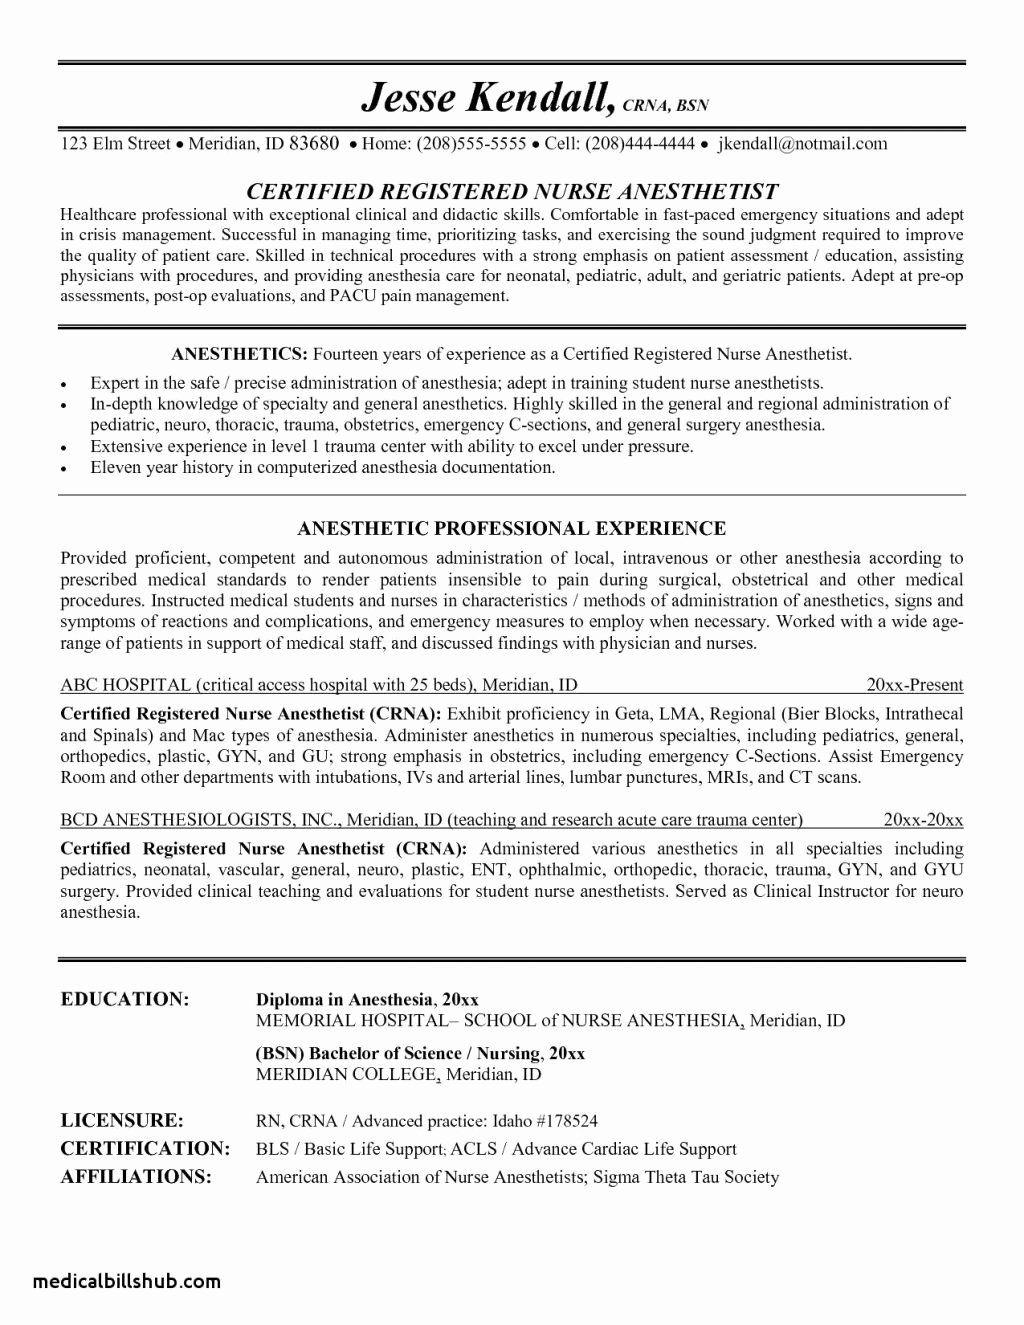 20 Entry Level Registered Nurse Resume in 2020